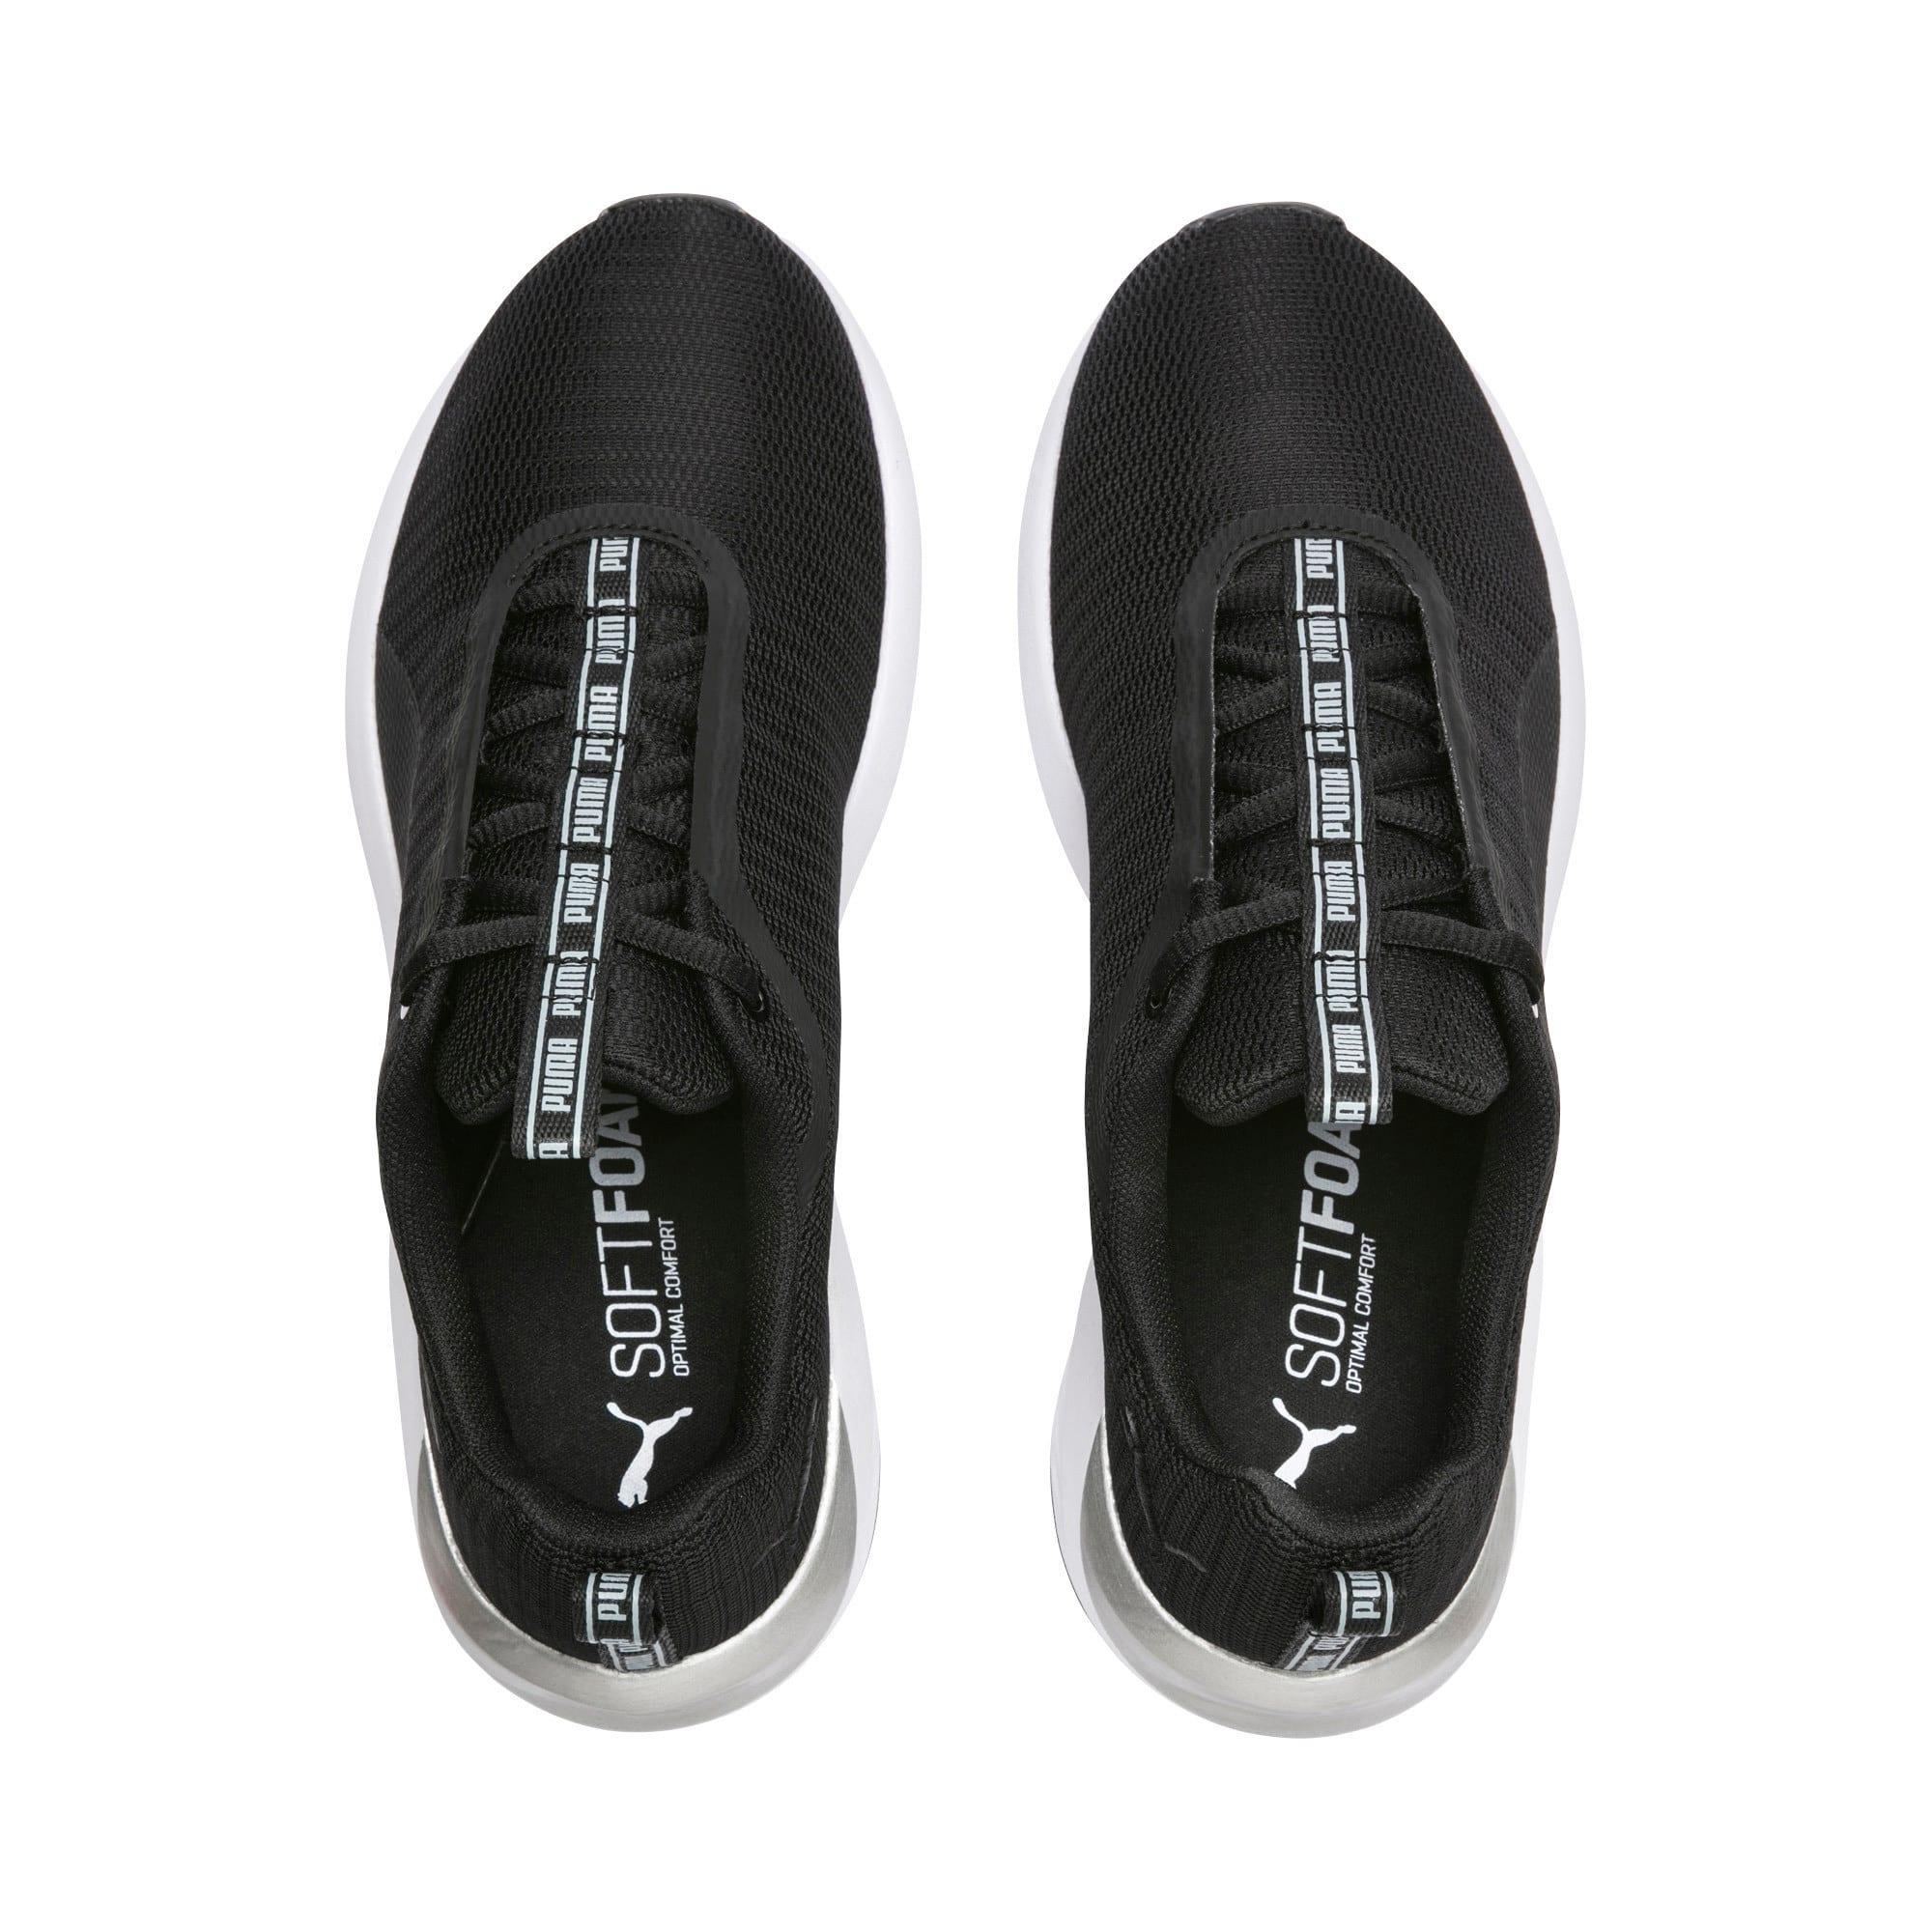 Thumbnail 6 of Prowl 2 Women's Training Shoes, Puma Black-Puma White, medium